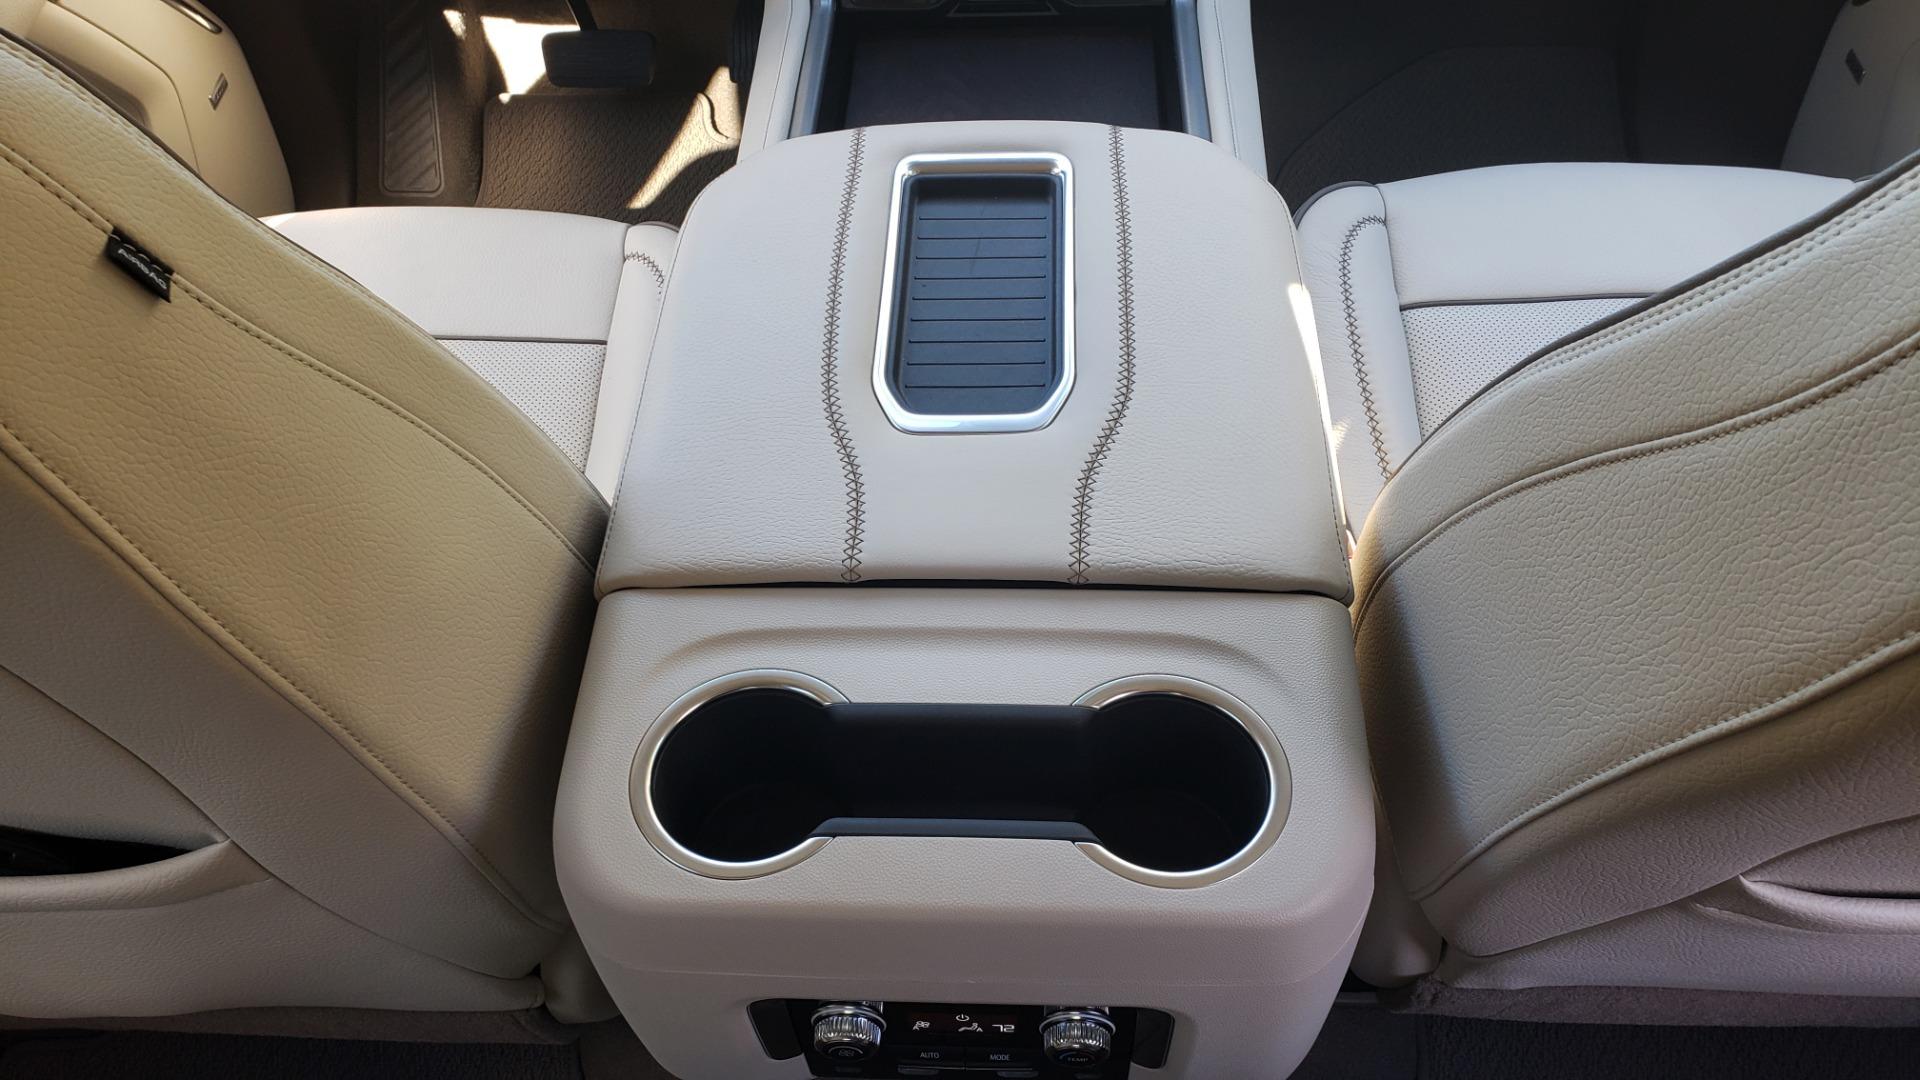 Used 2021 GMC YUKON DENALI PREMIUM 4WD / NAV / ADVANCED TECH / ENTERTAINMENT for sale Sold at Formula Imports in Charlotte NC 28227 100